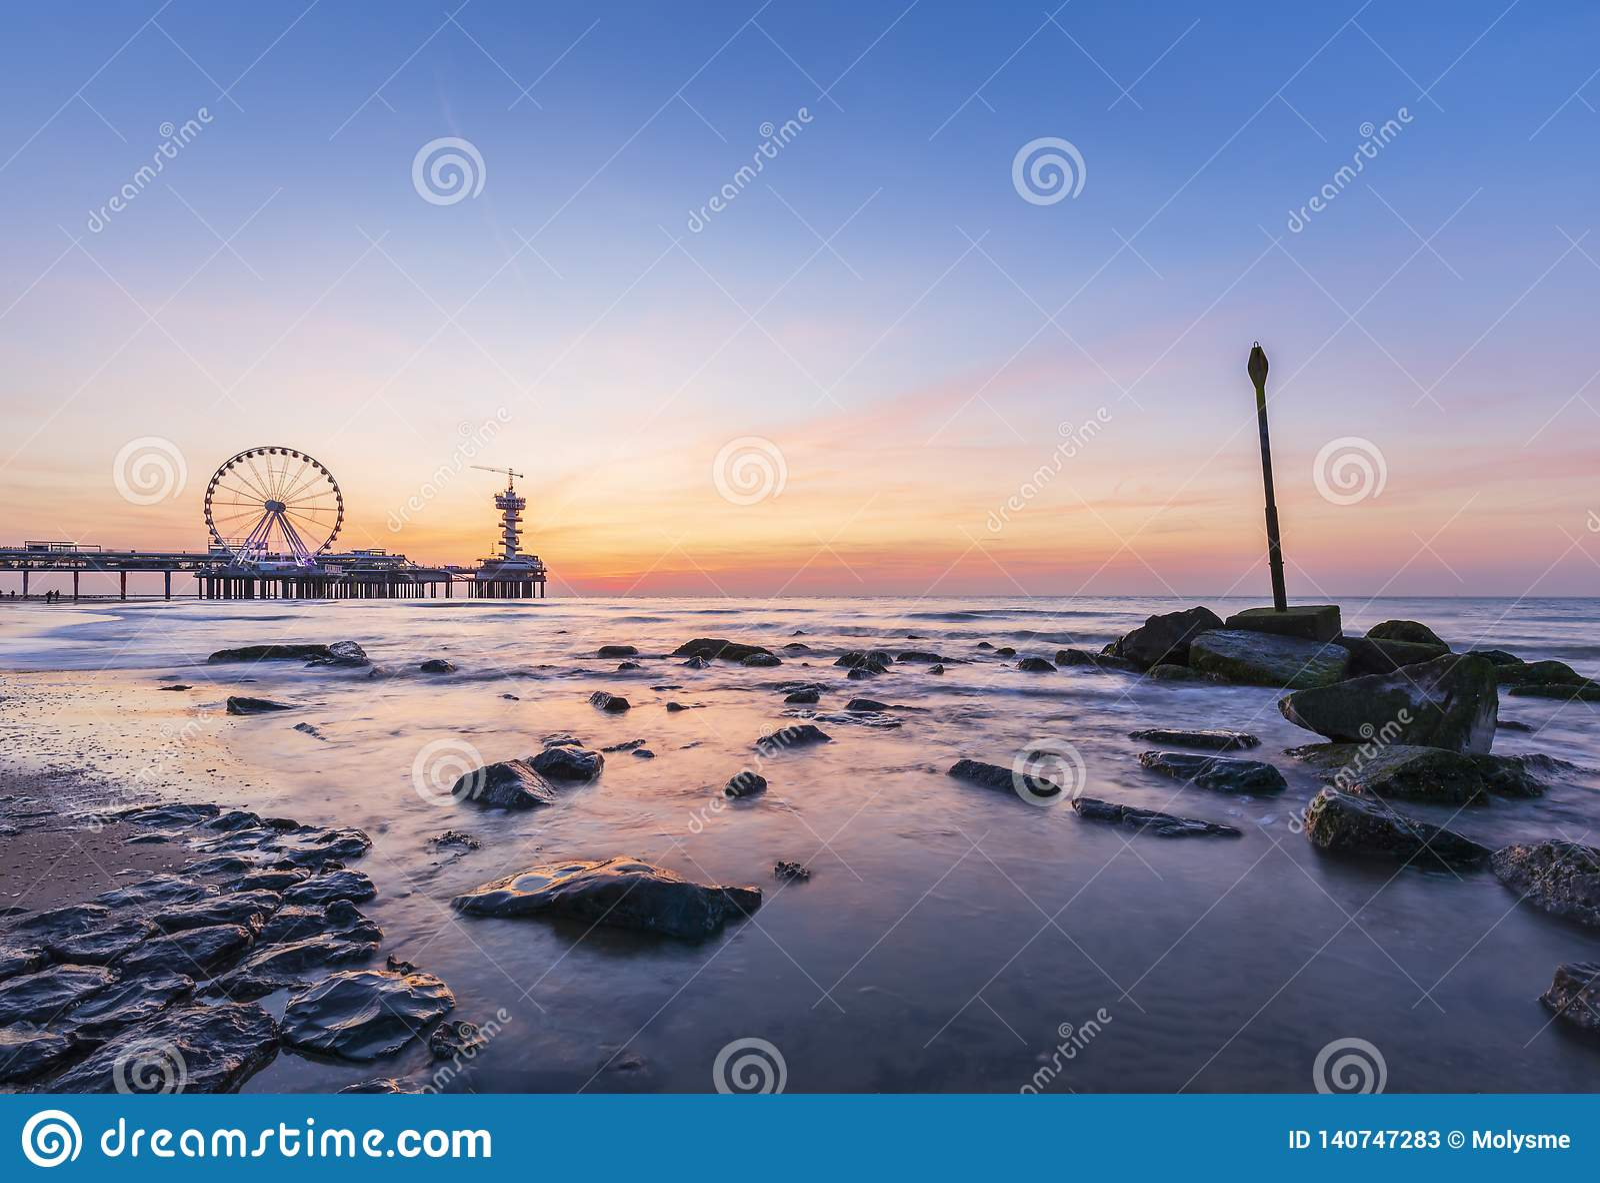 Colorful sunset on coastline, beach, pier and ferris wheel, Scheveningen, the Hague